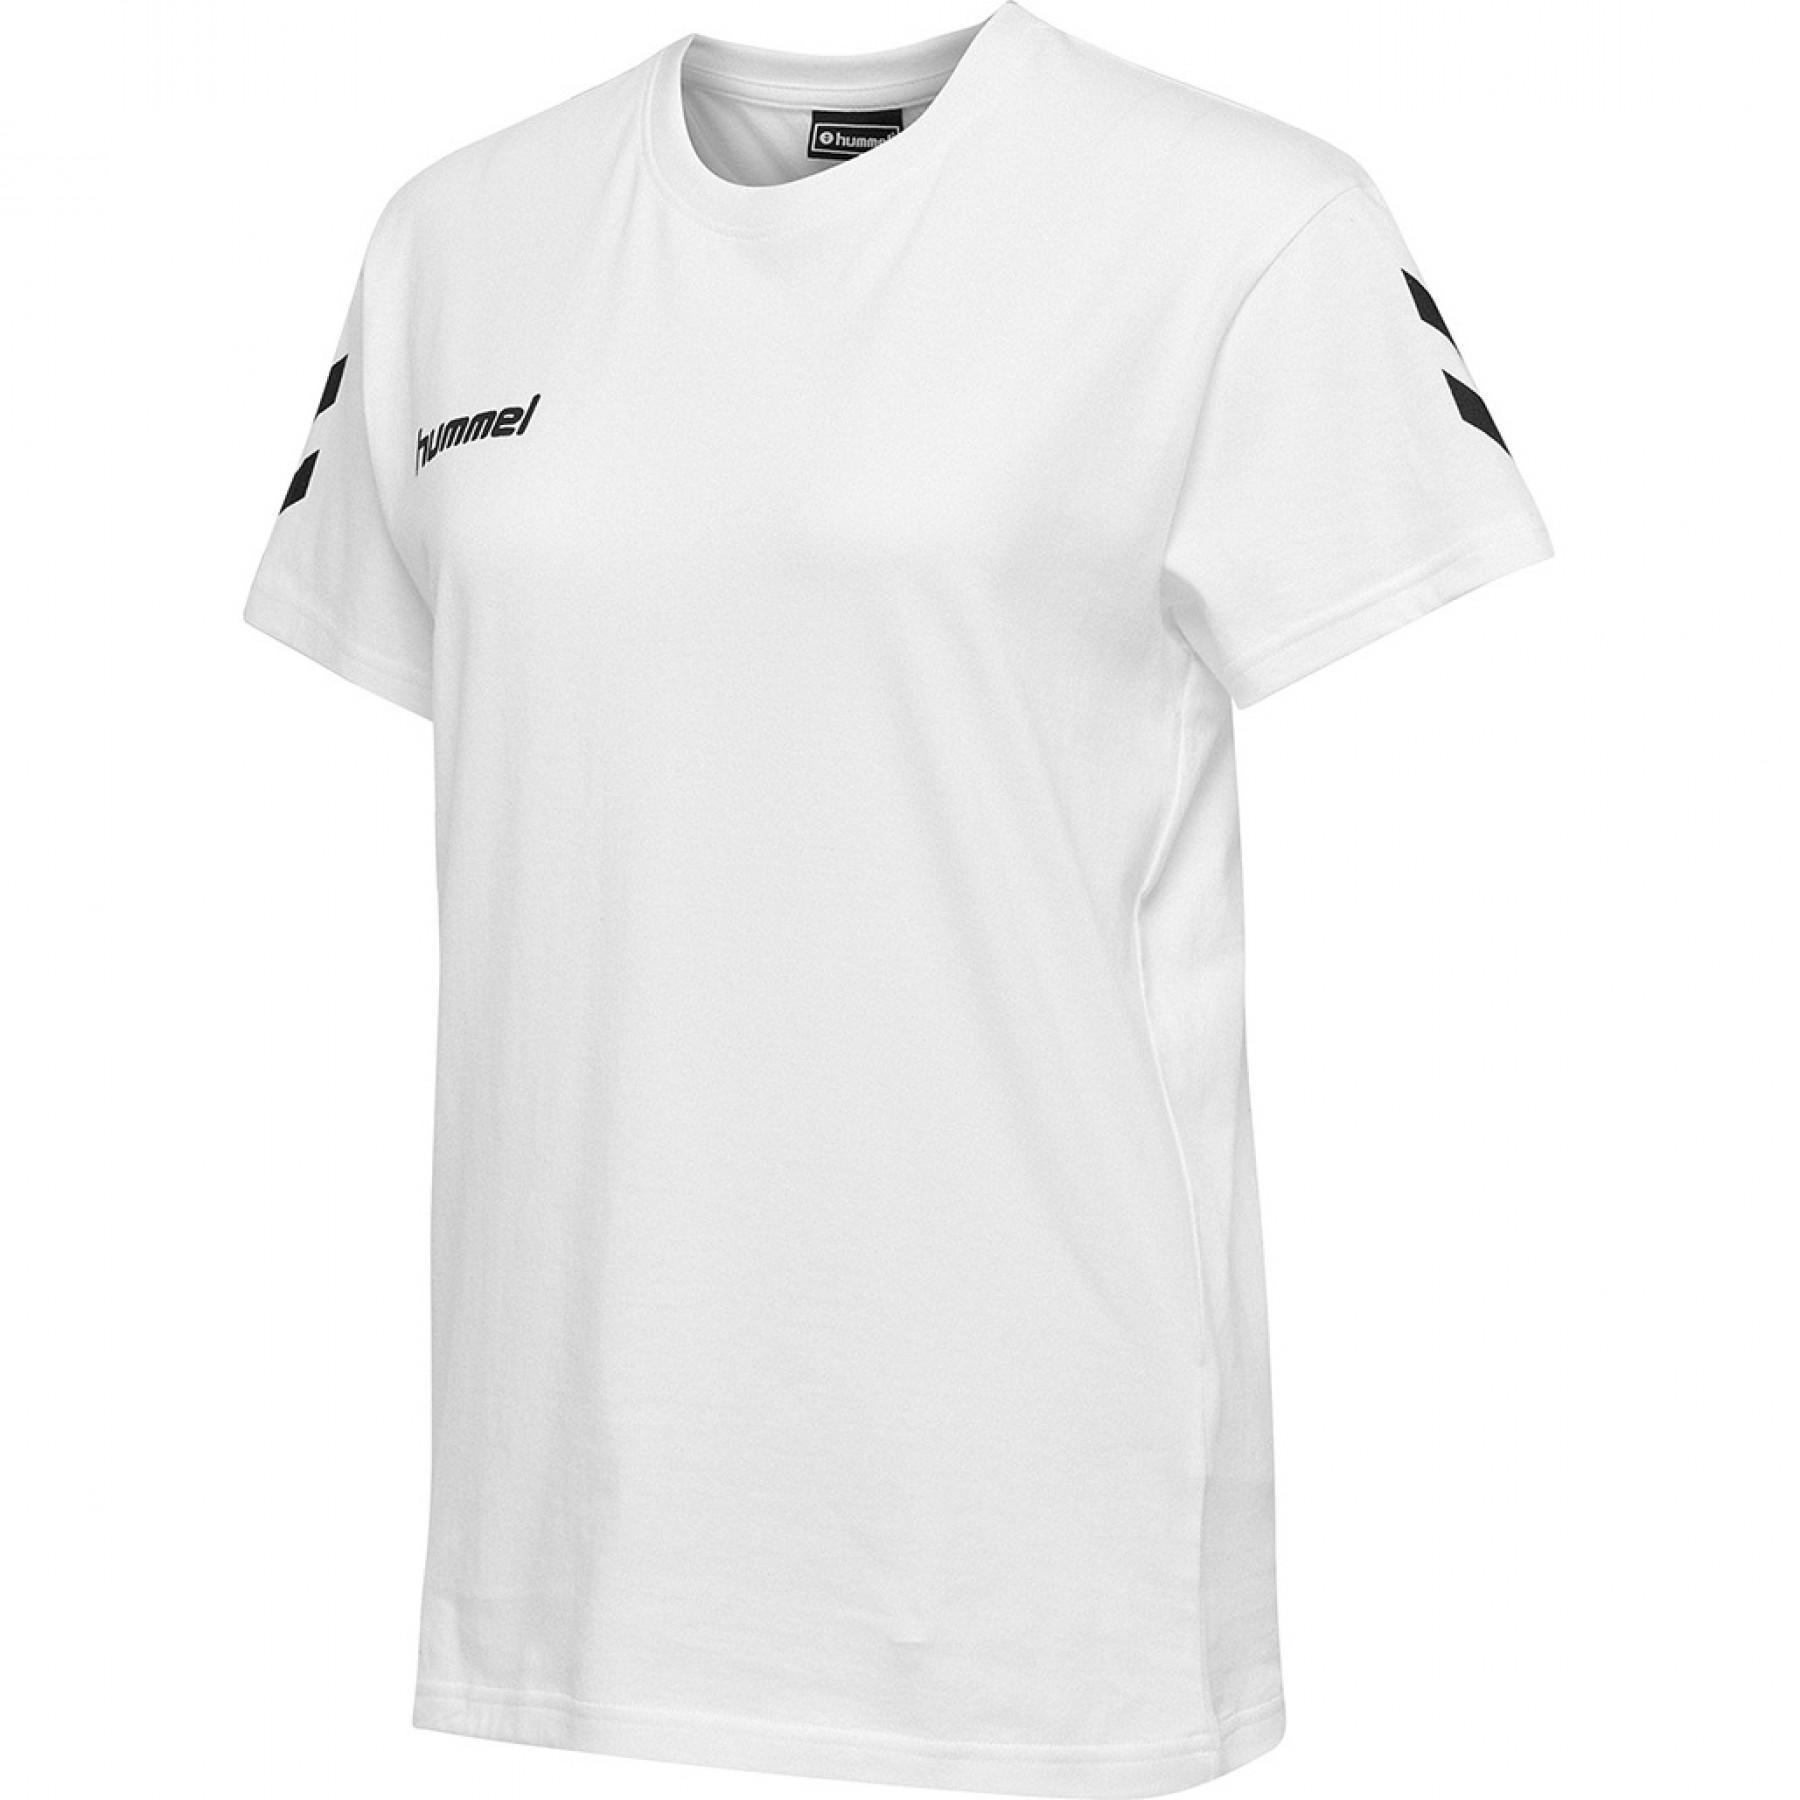 Women T-shirt Hummel hmlgo cotton